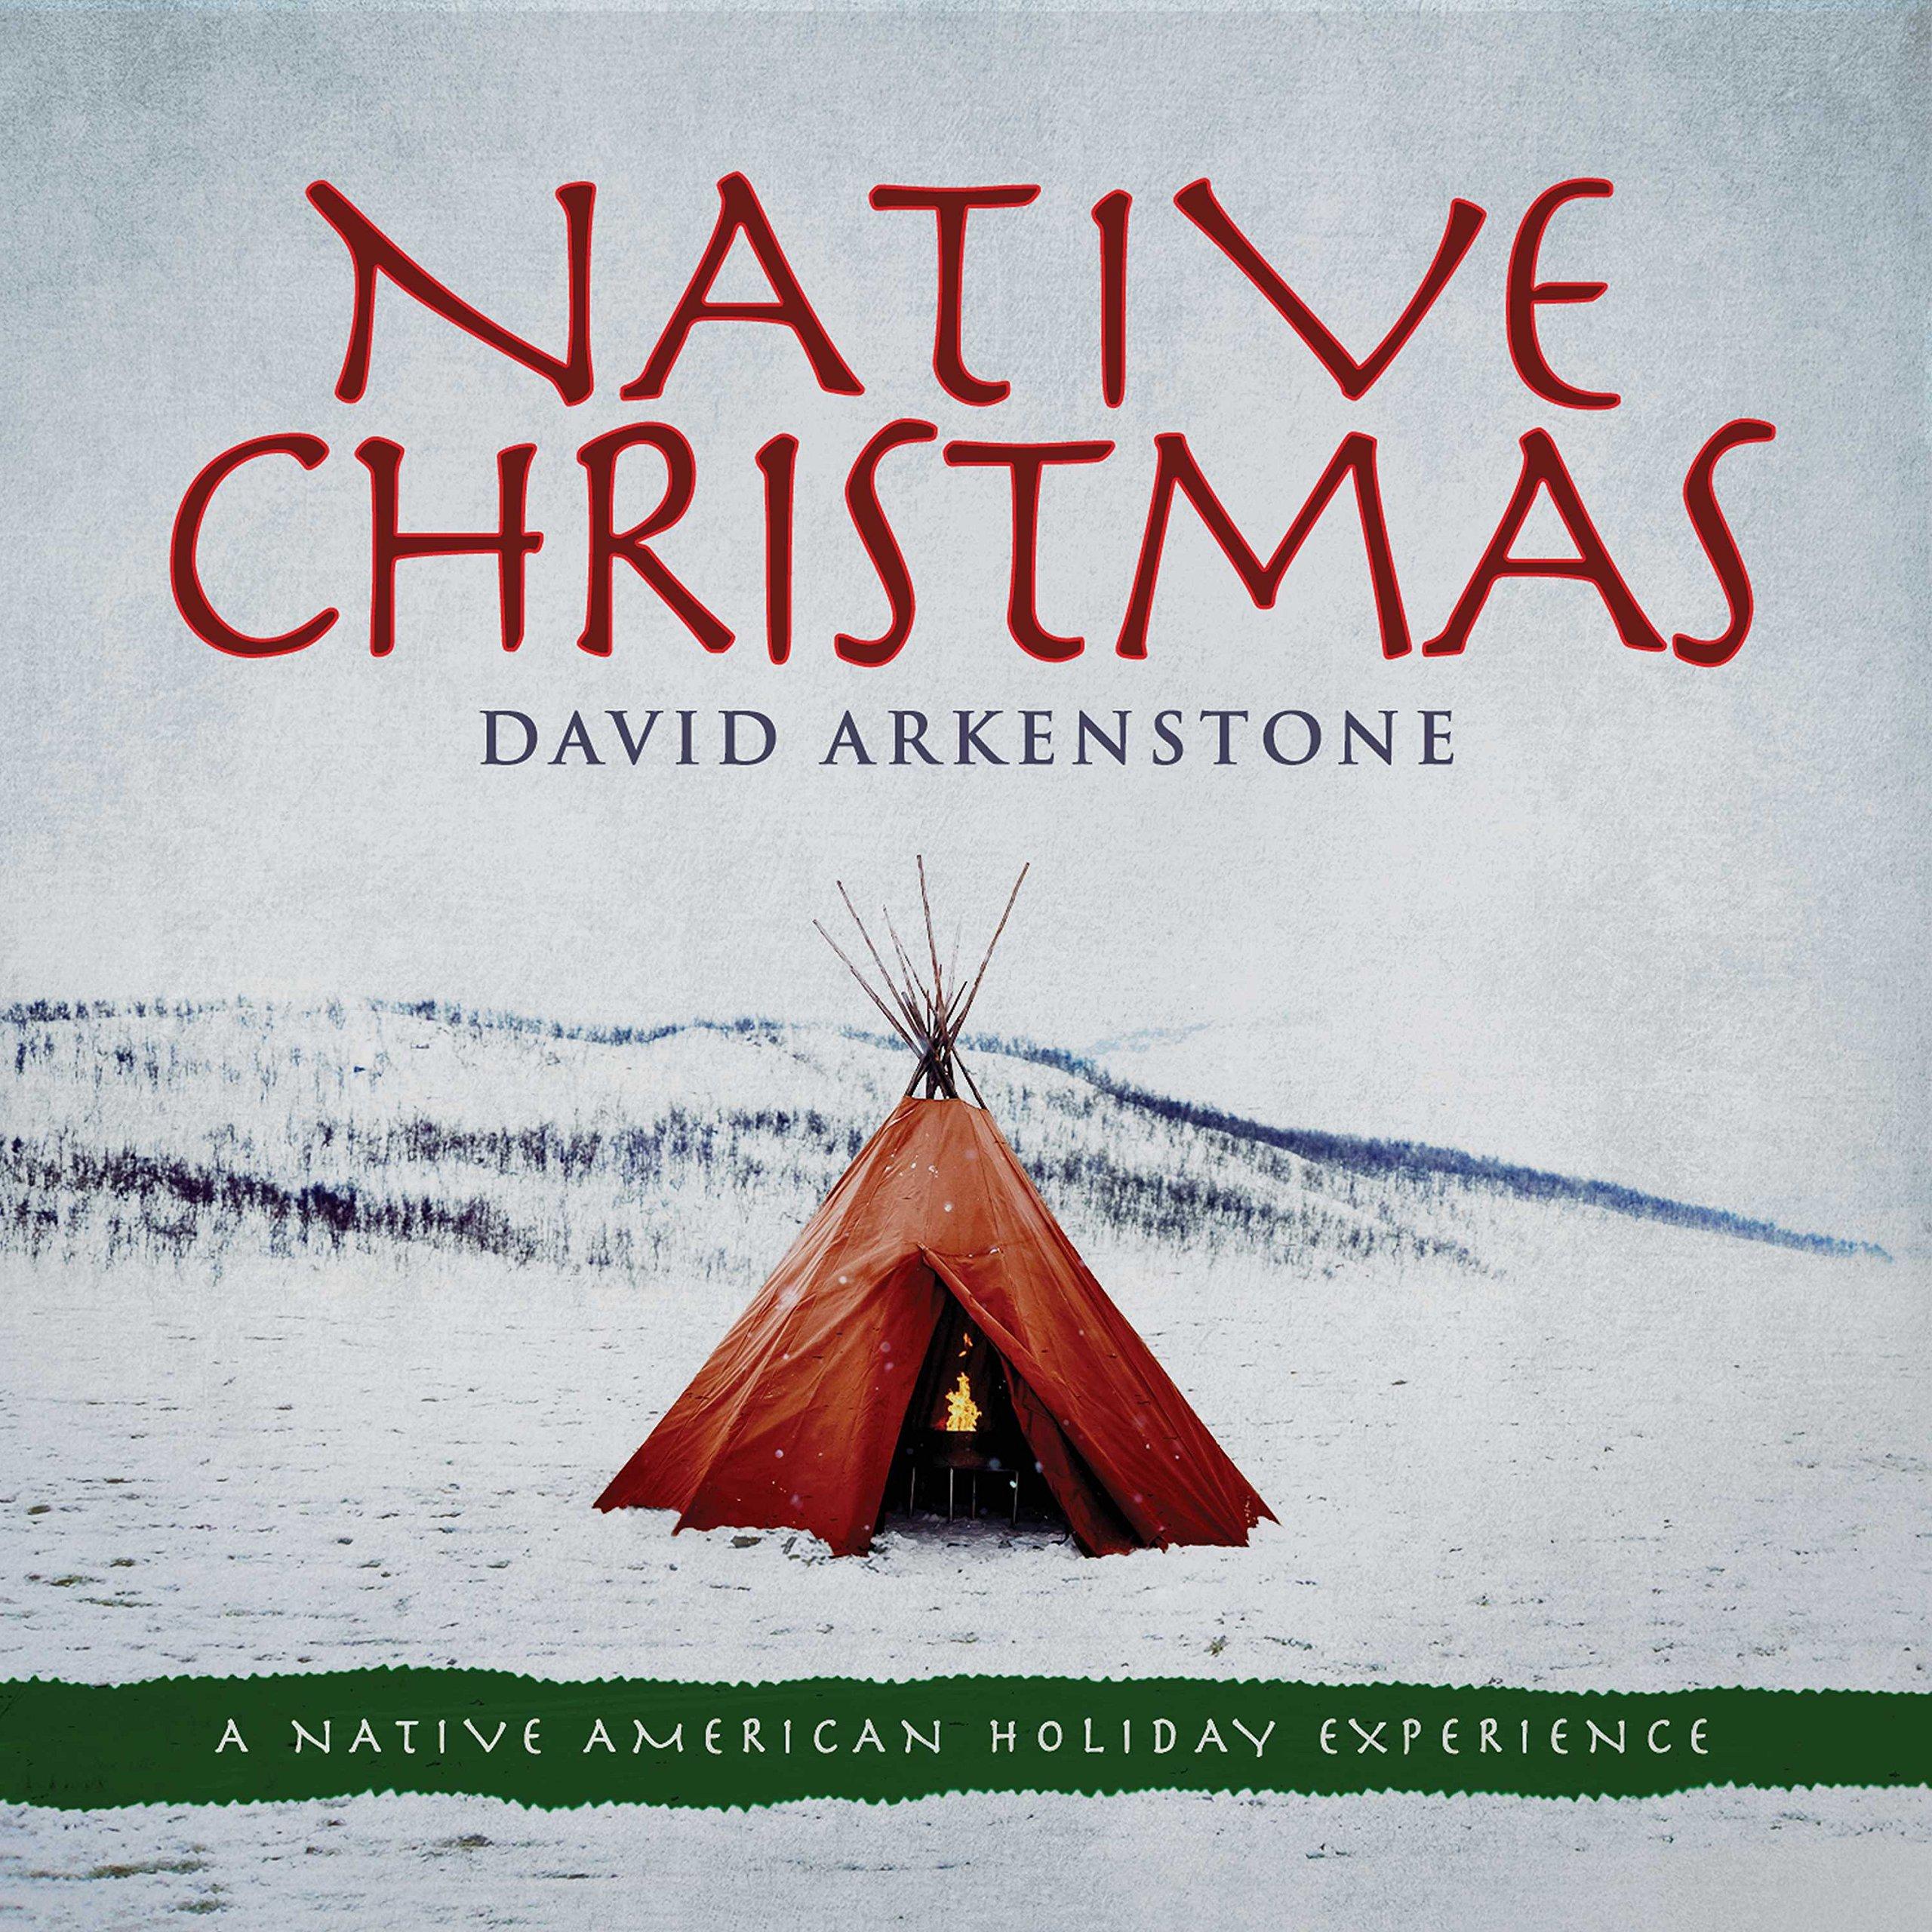 David Arkenstone - Native Christmas